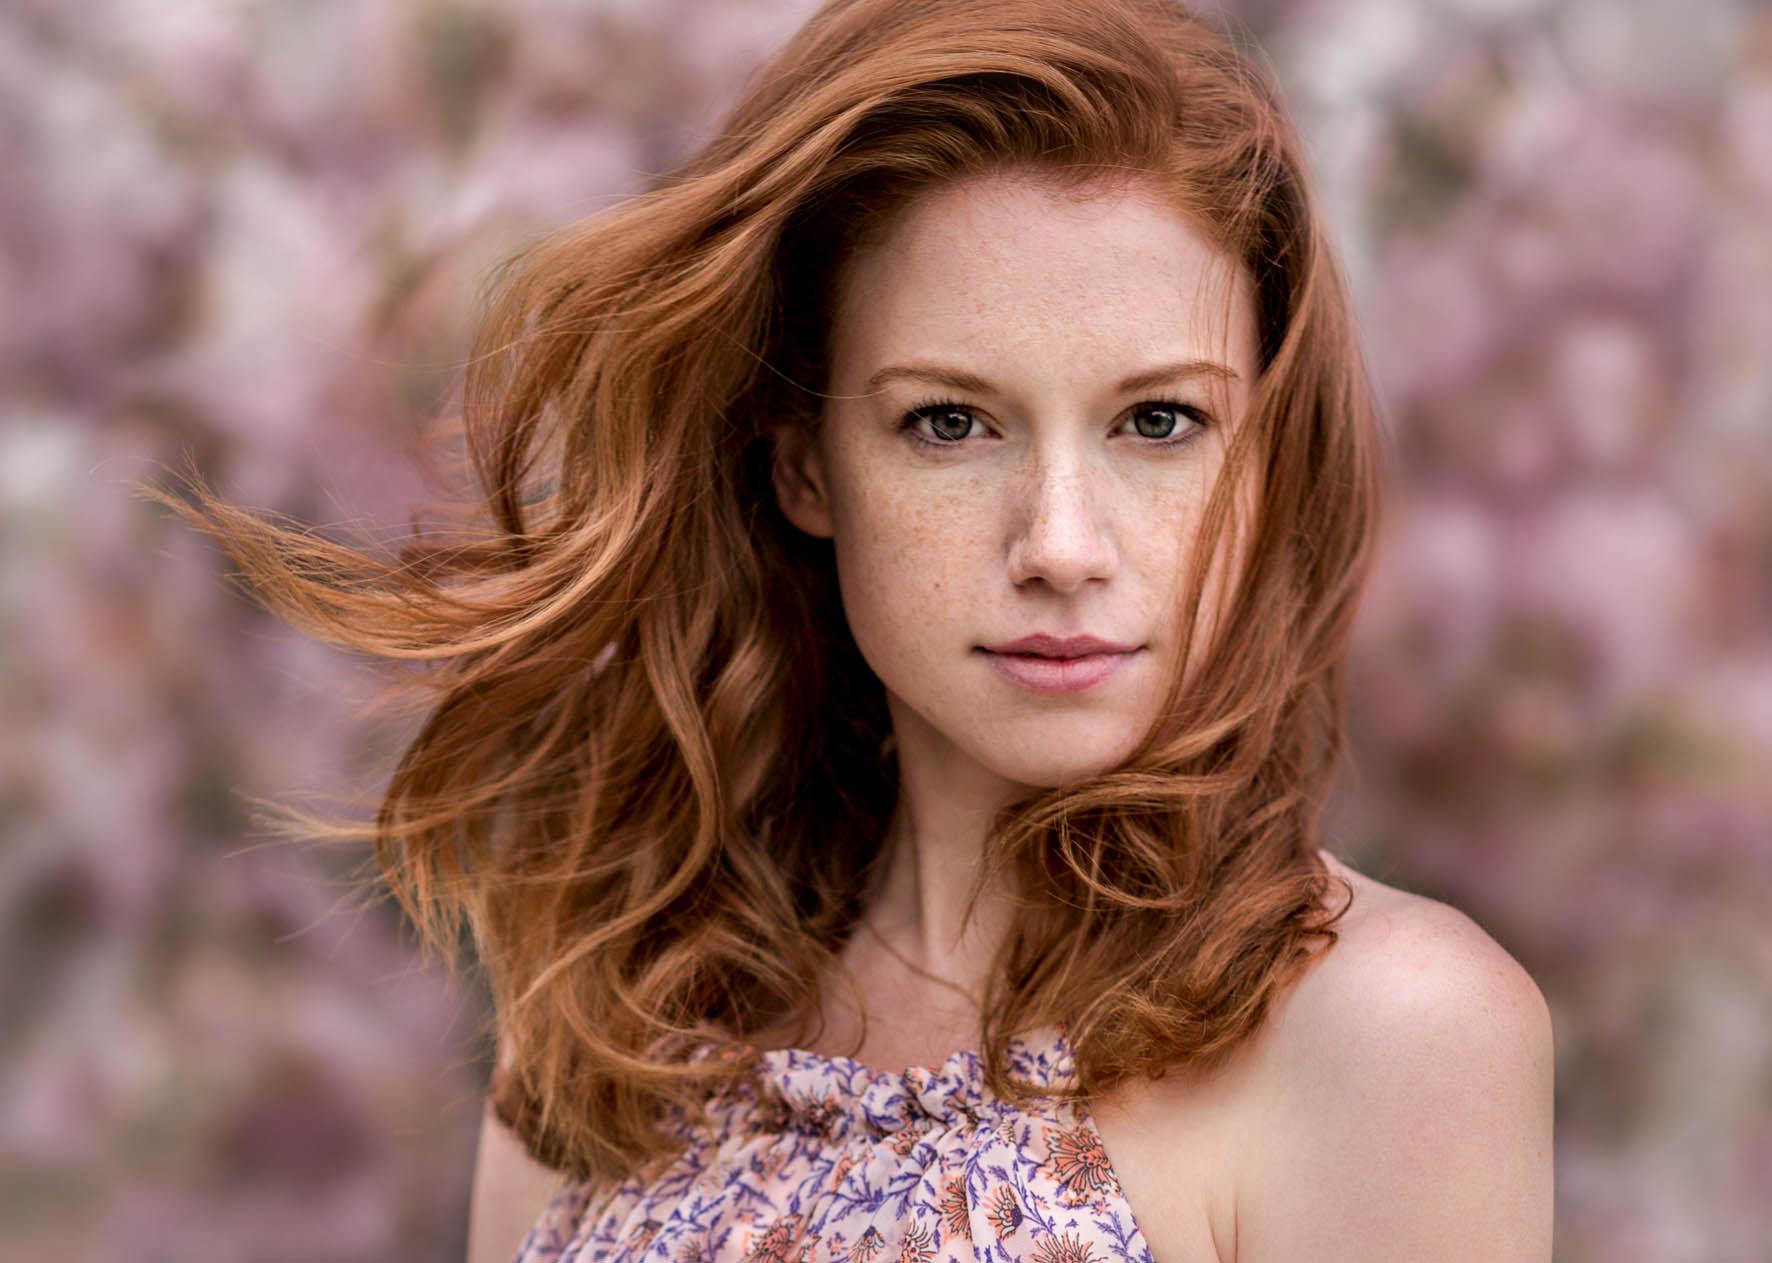 Redhair Model Antonia mit Floralkleid